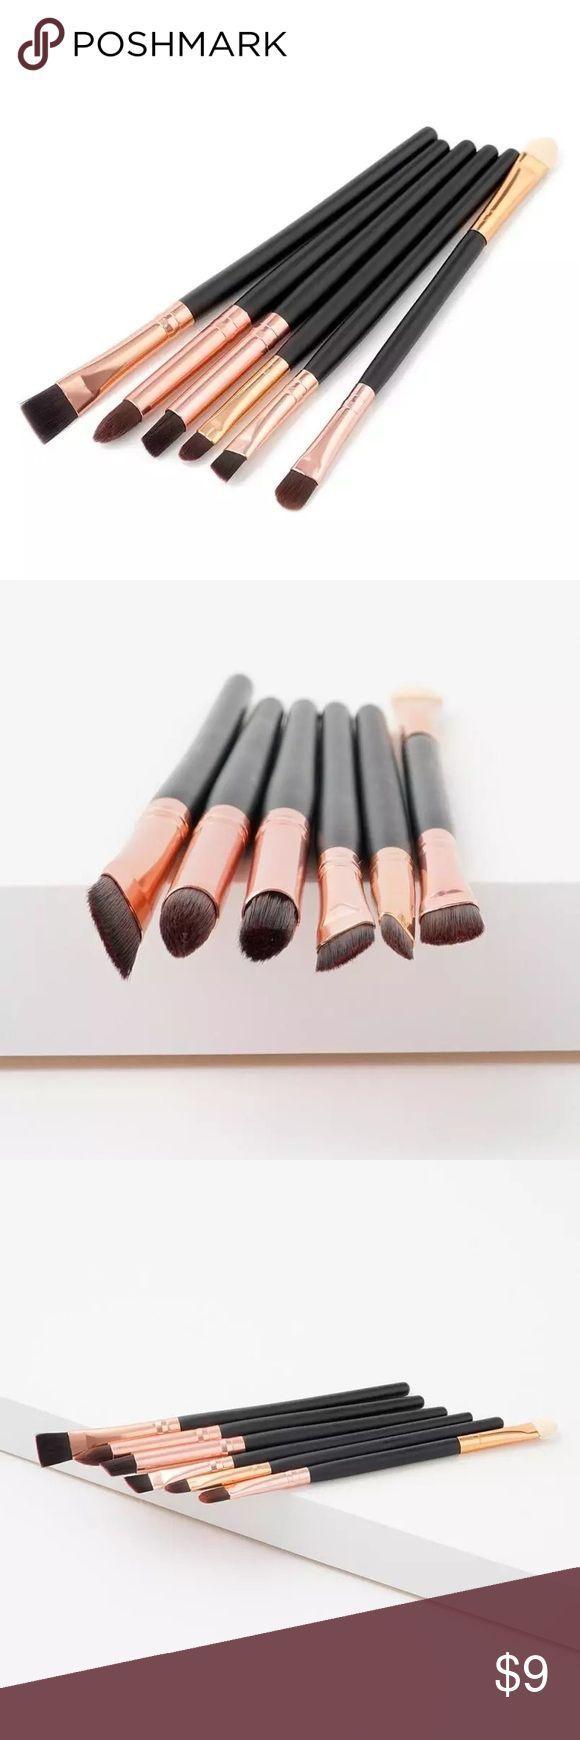 Photo of 6PCS Rose Gold Makeup Brush Set 6PCS Rose Gold Makeup Brush Set. Used for eyebro,  #6PCS #Bru…